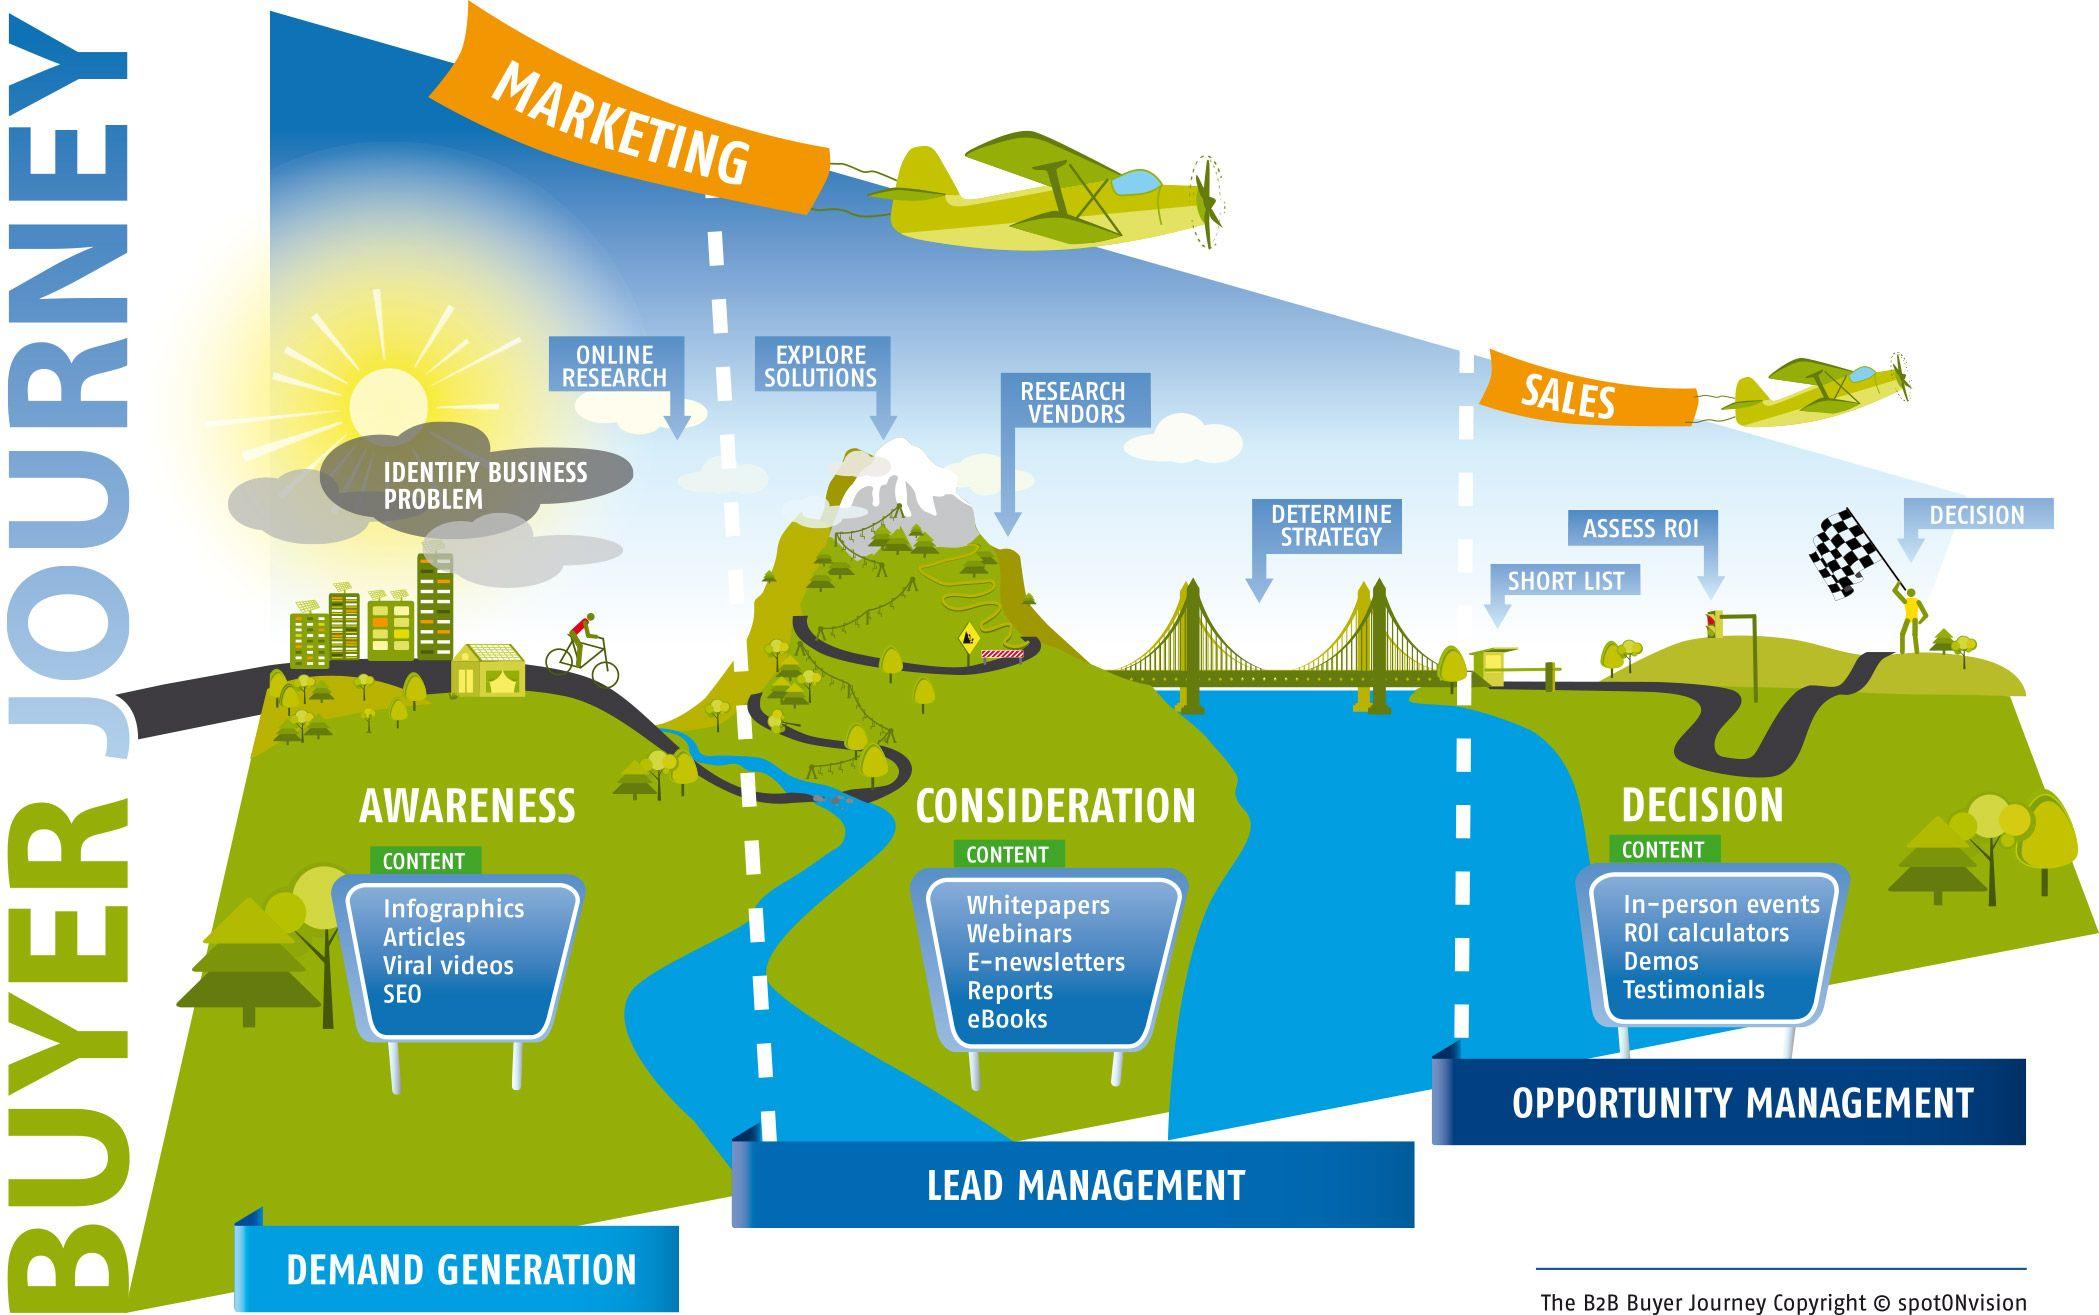 B2b marketing de buyer journey marketingfacts content